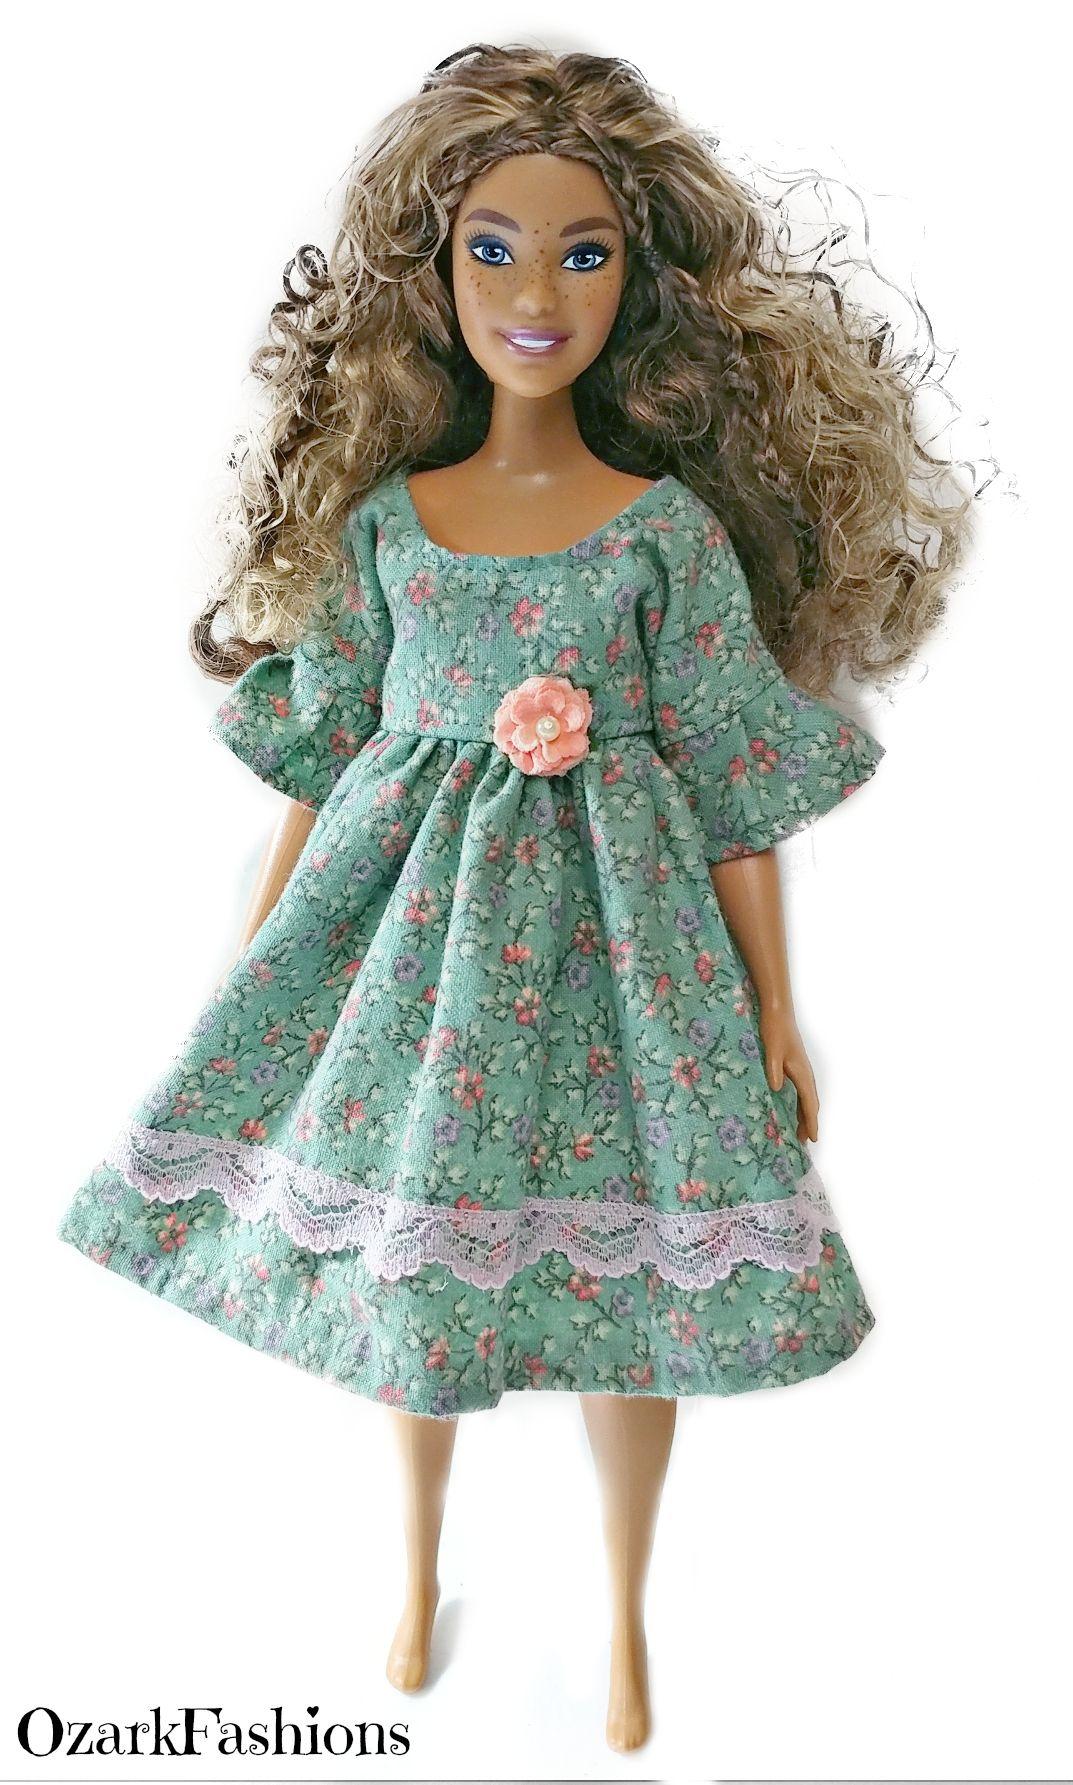 Long Dress made for Curvy Barbie Fashionista Doll Clothes TKCT Dark purple